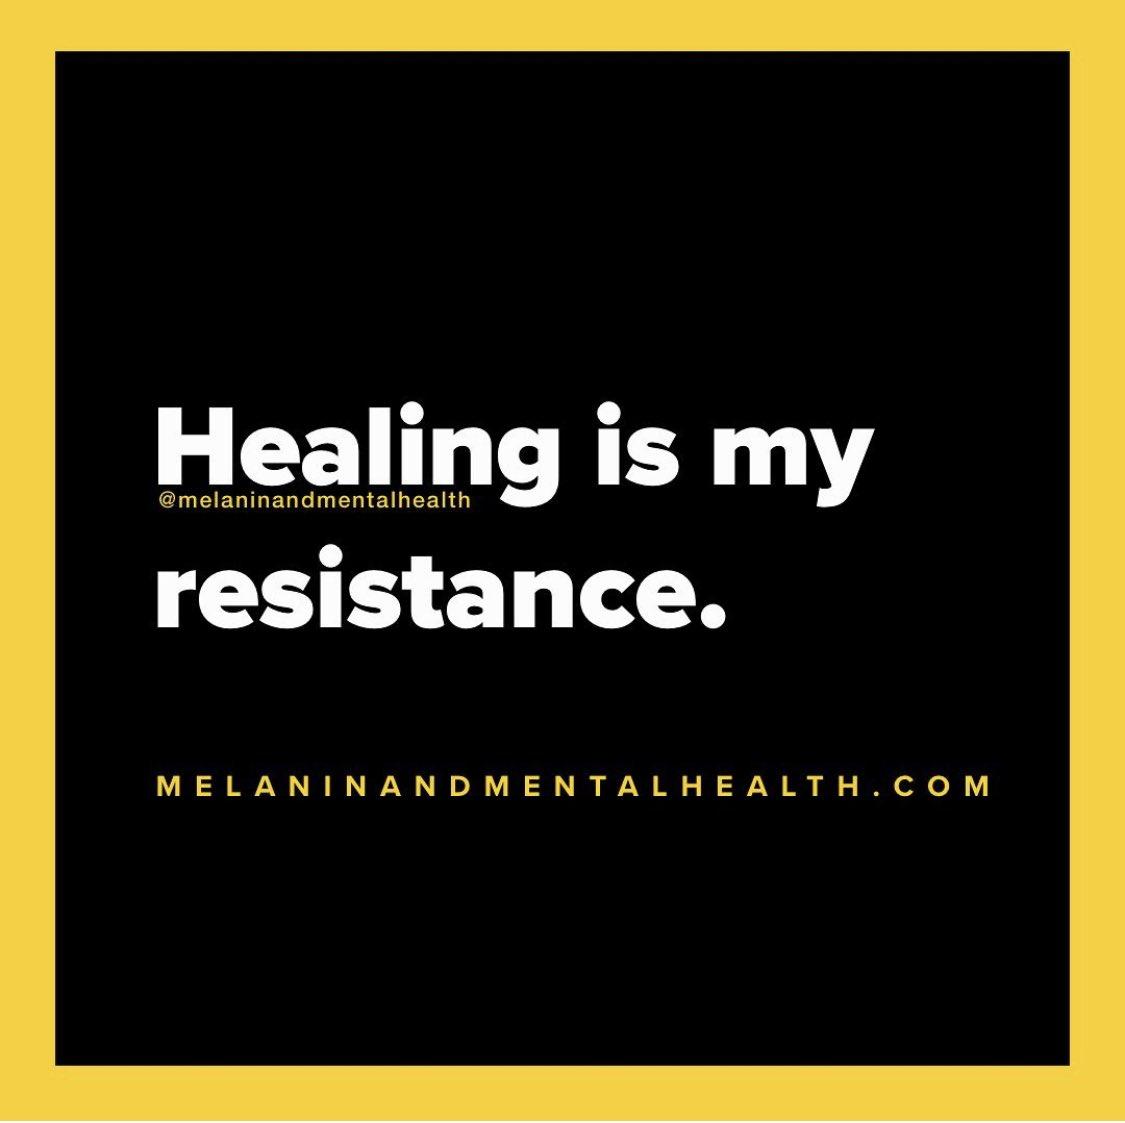 #message #healing #LetsHeal #wethepeopleofaustin #austinrenaissance https://t.co/6XwTSwZCud